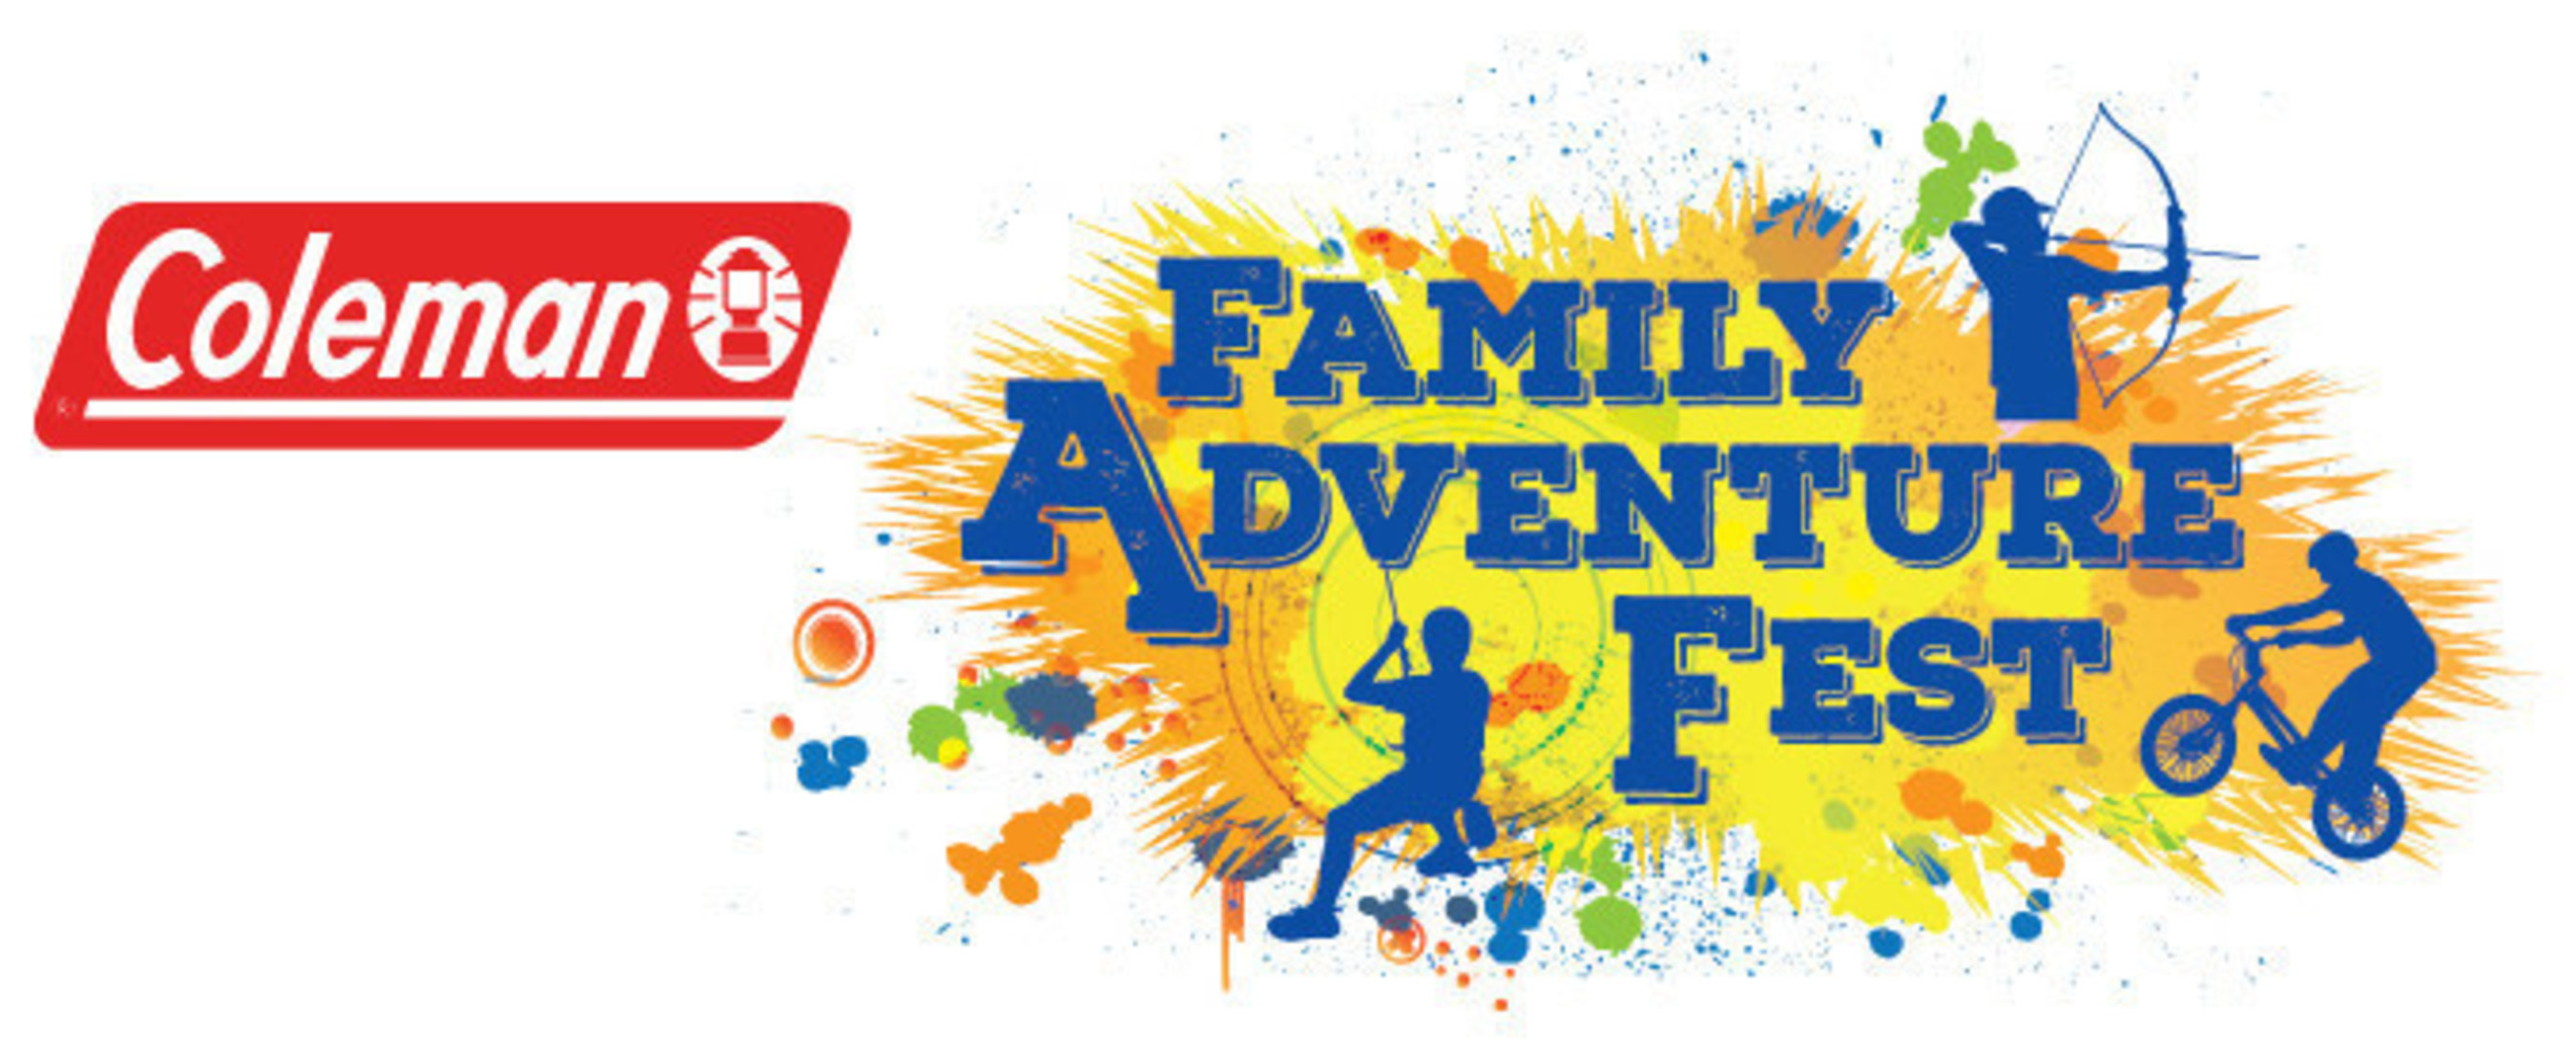 ¡Family AdventureFest llega este verano a Dallas/Fort Worth!